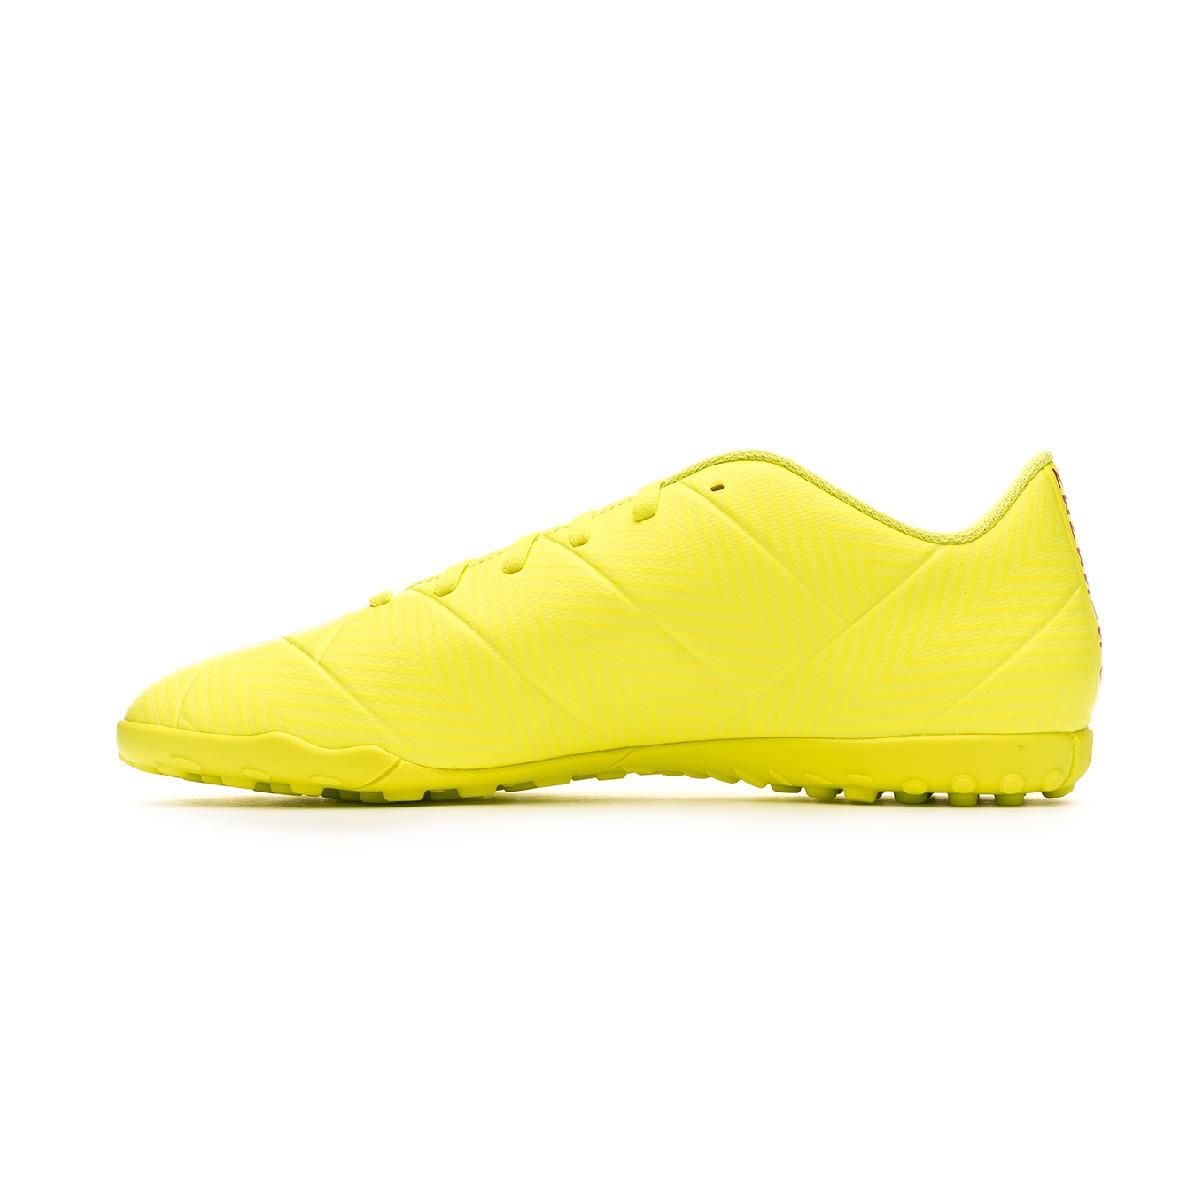 Anormal Majestuoso Resignación  Football Boot adidas Nemeziz Tango 18.4 Turf Solar yellow-Football  blue-Active red - Football store Fútbol Emotion